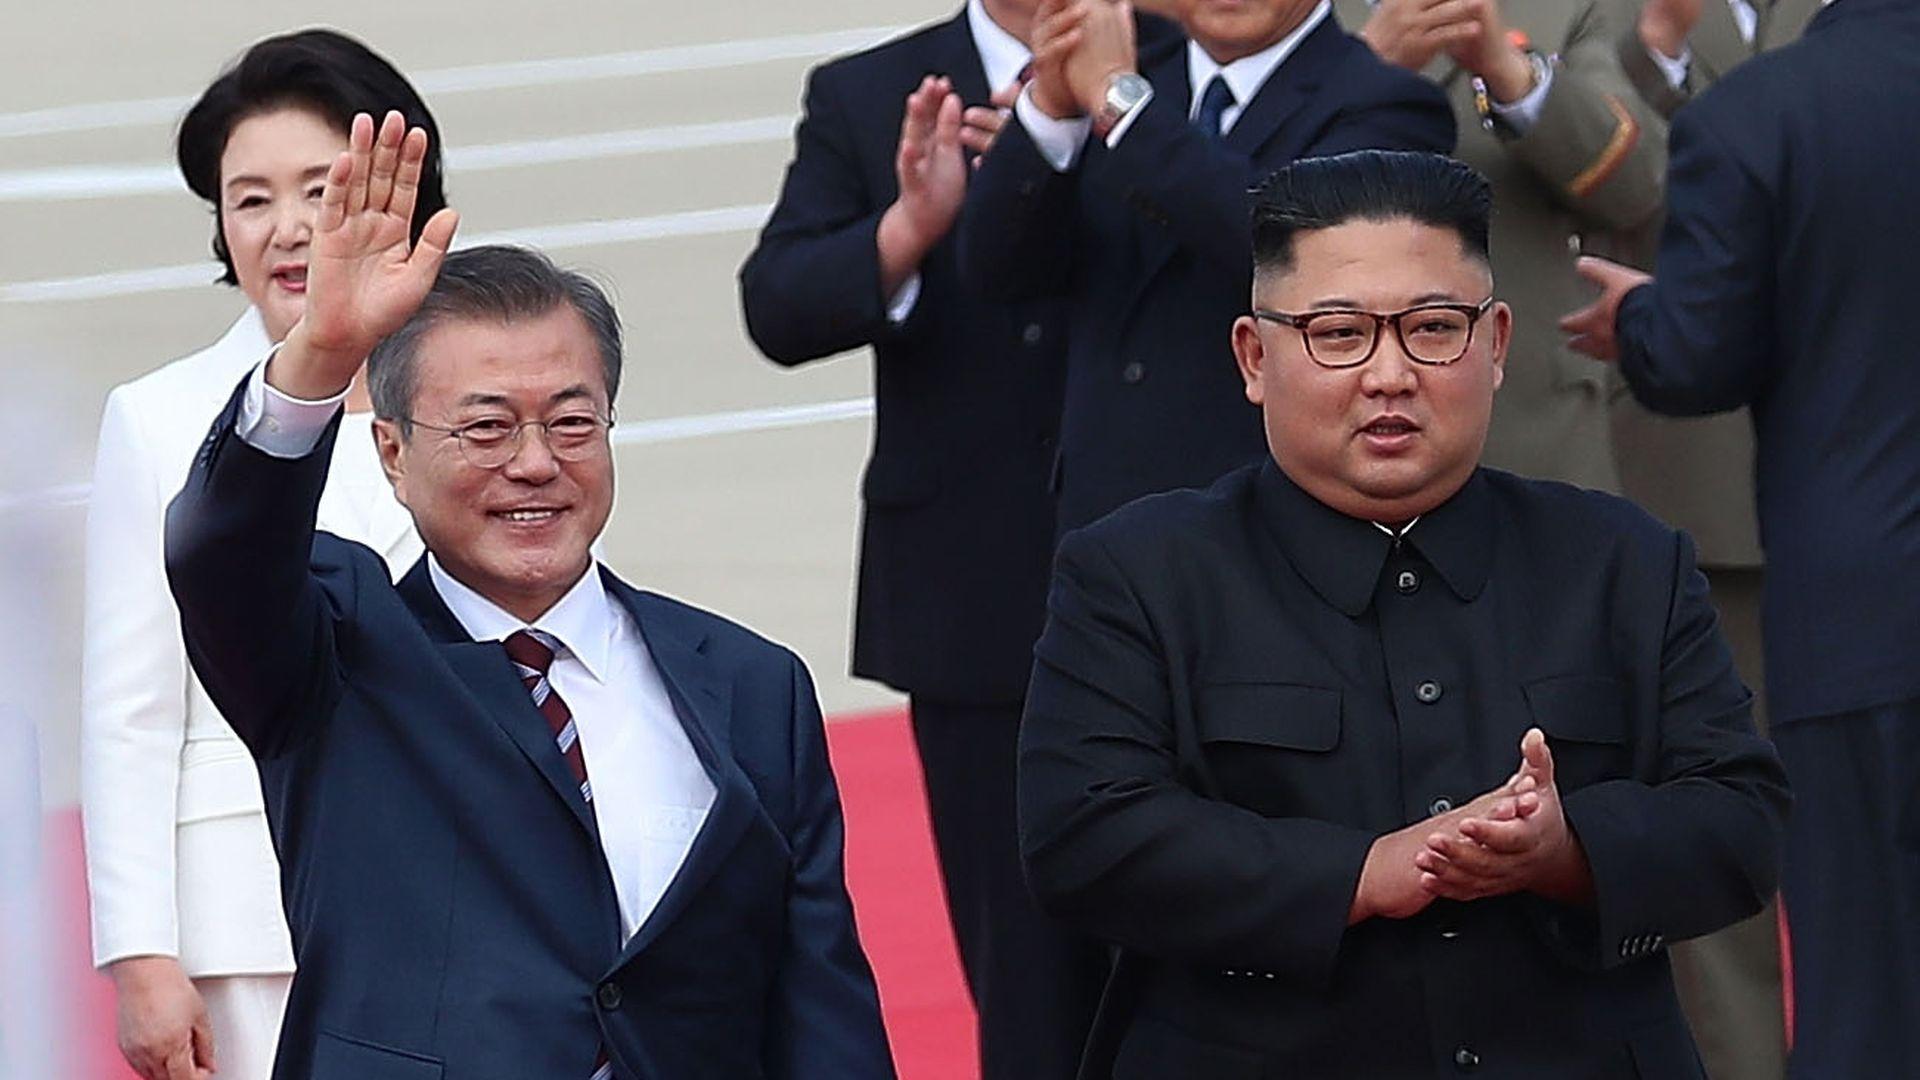 North Korean Leader Kim Jong Un meets with South Korean President Moon Jae-in for the Inter-Korean Summit at Pyongyang Sunan International Airport on September 18, 2018.